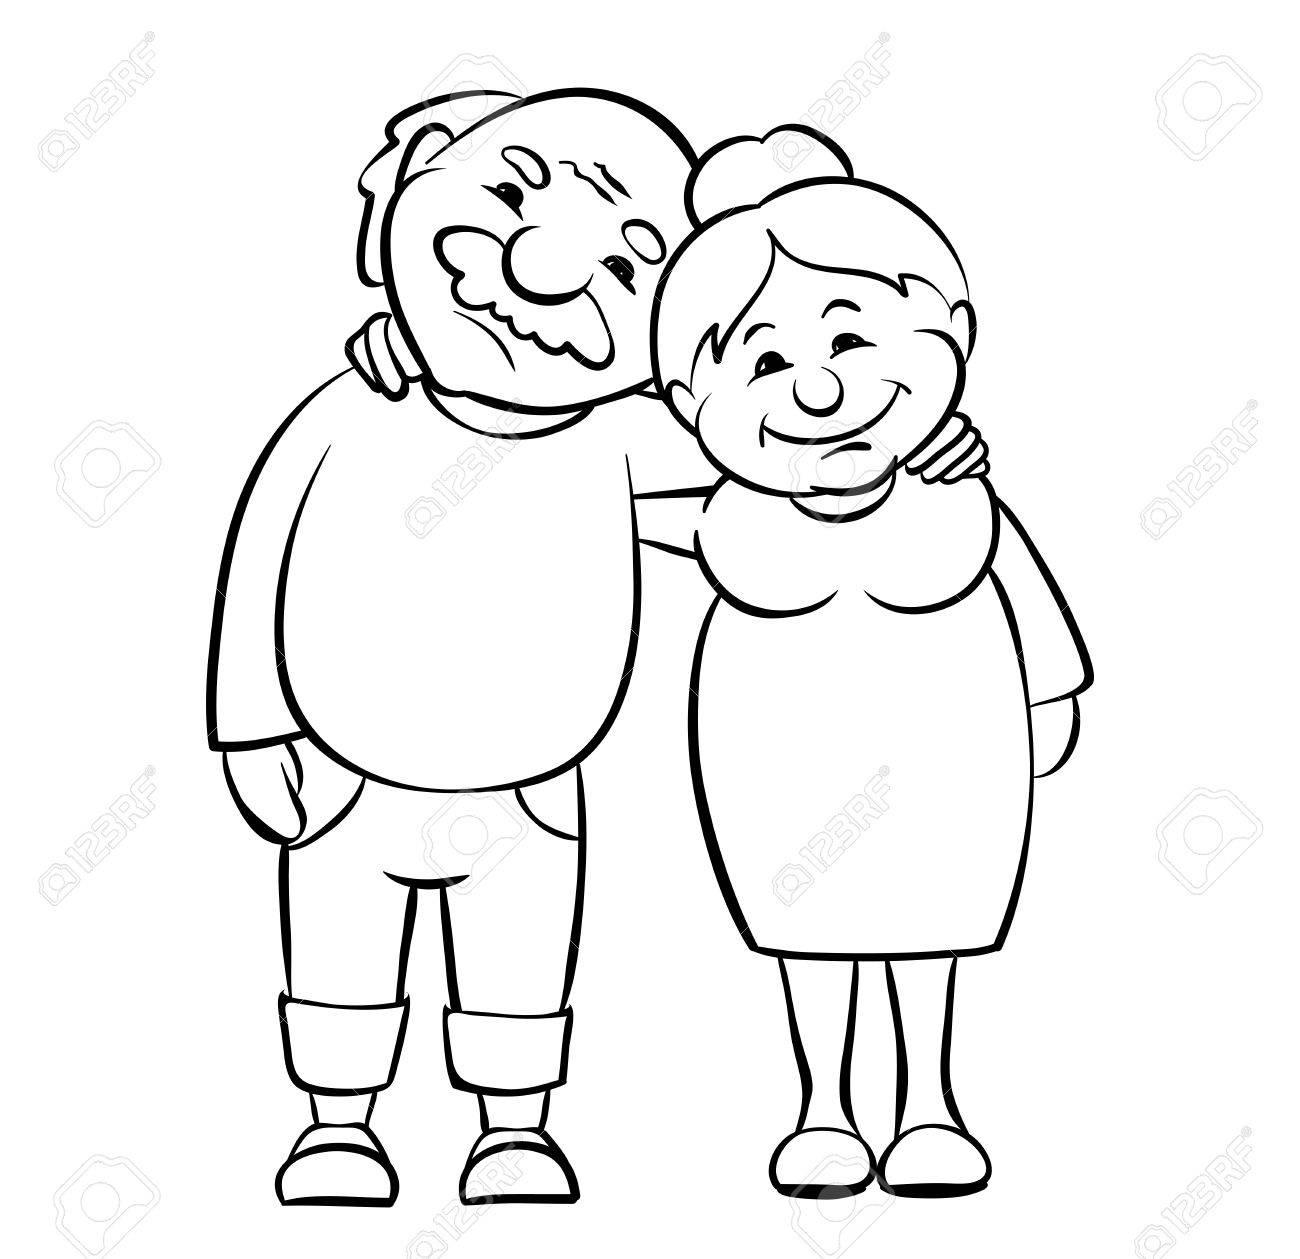 1300x1259 Happy Seniors Couple Vector Graphic Illustration Of Grandparents